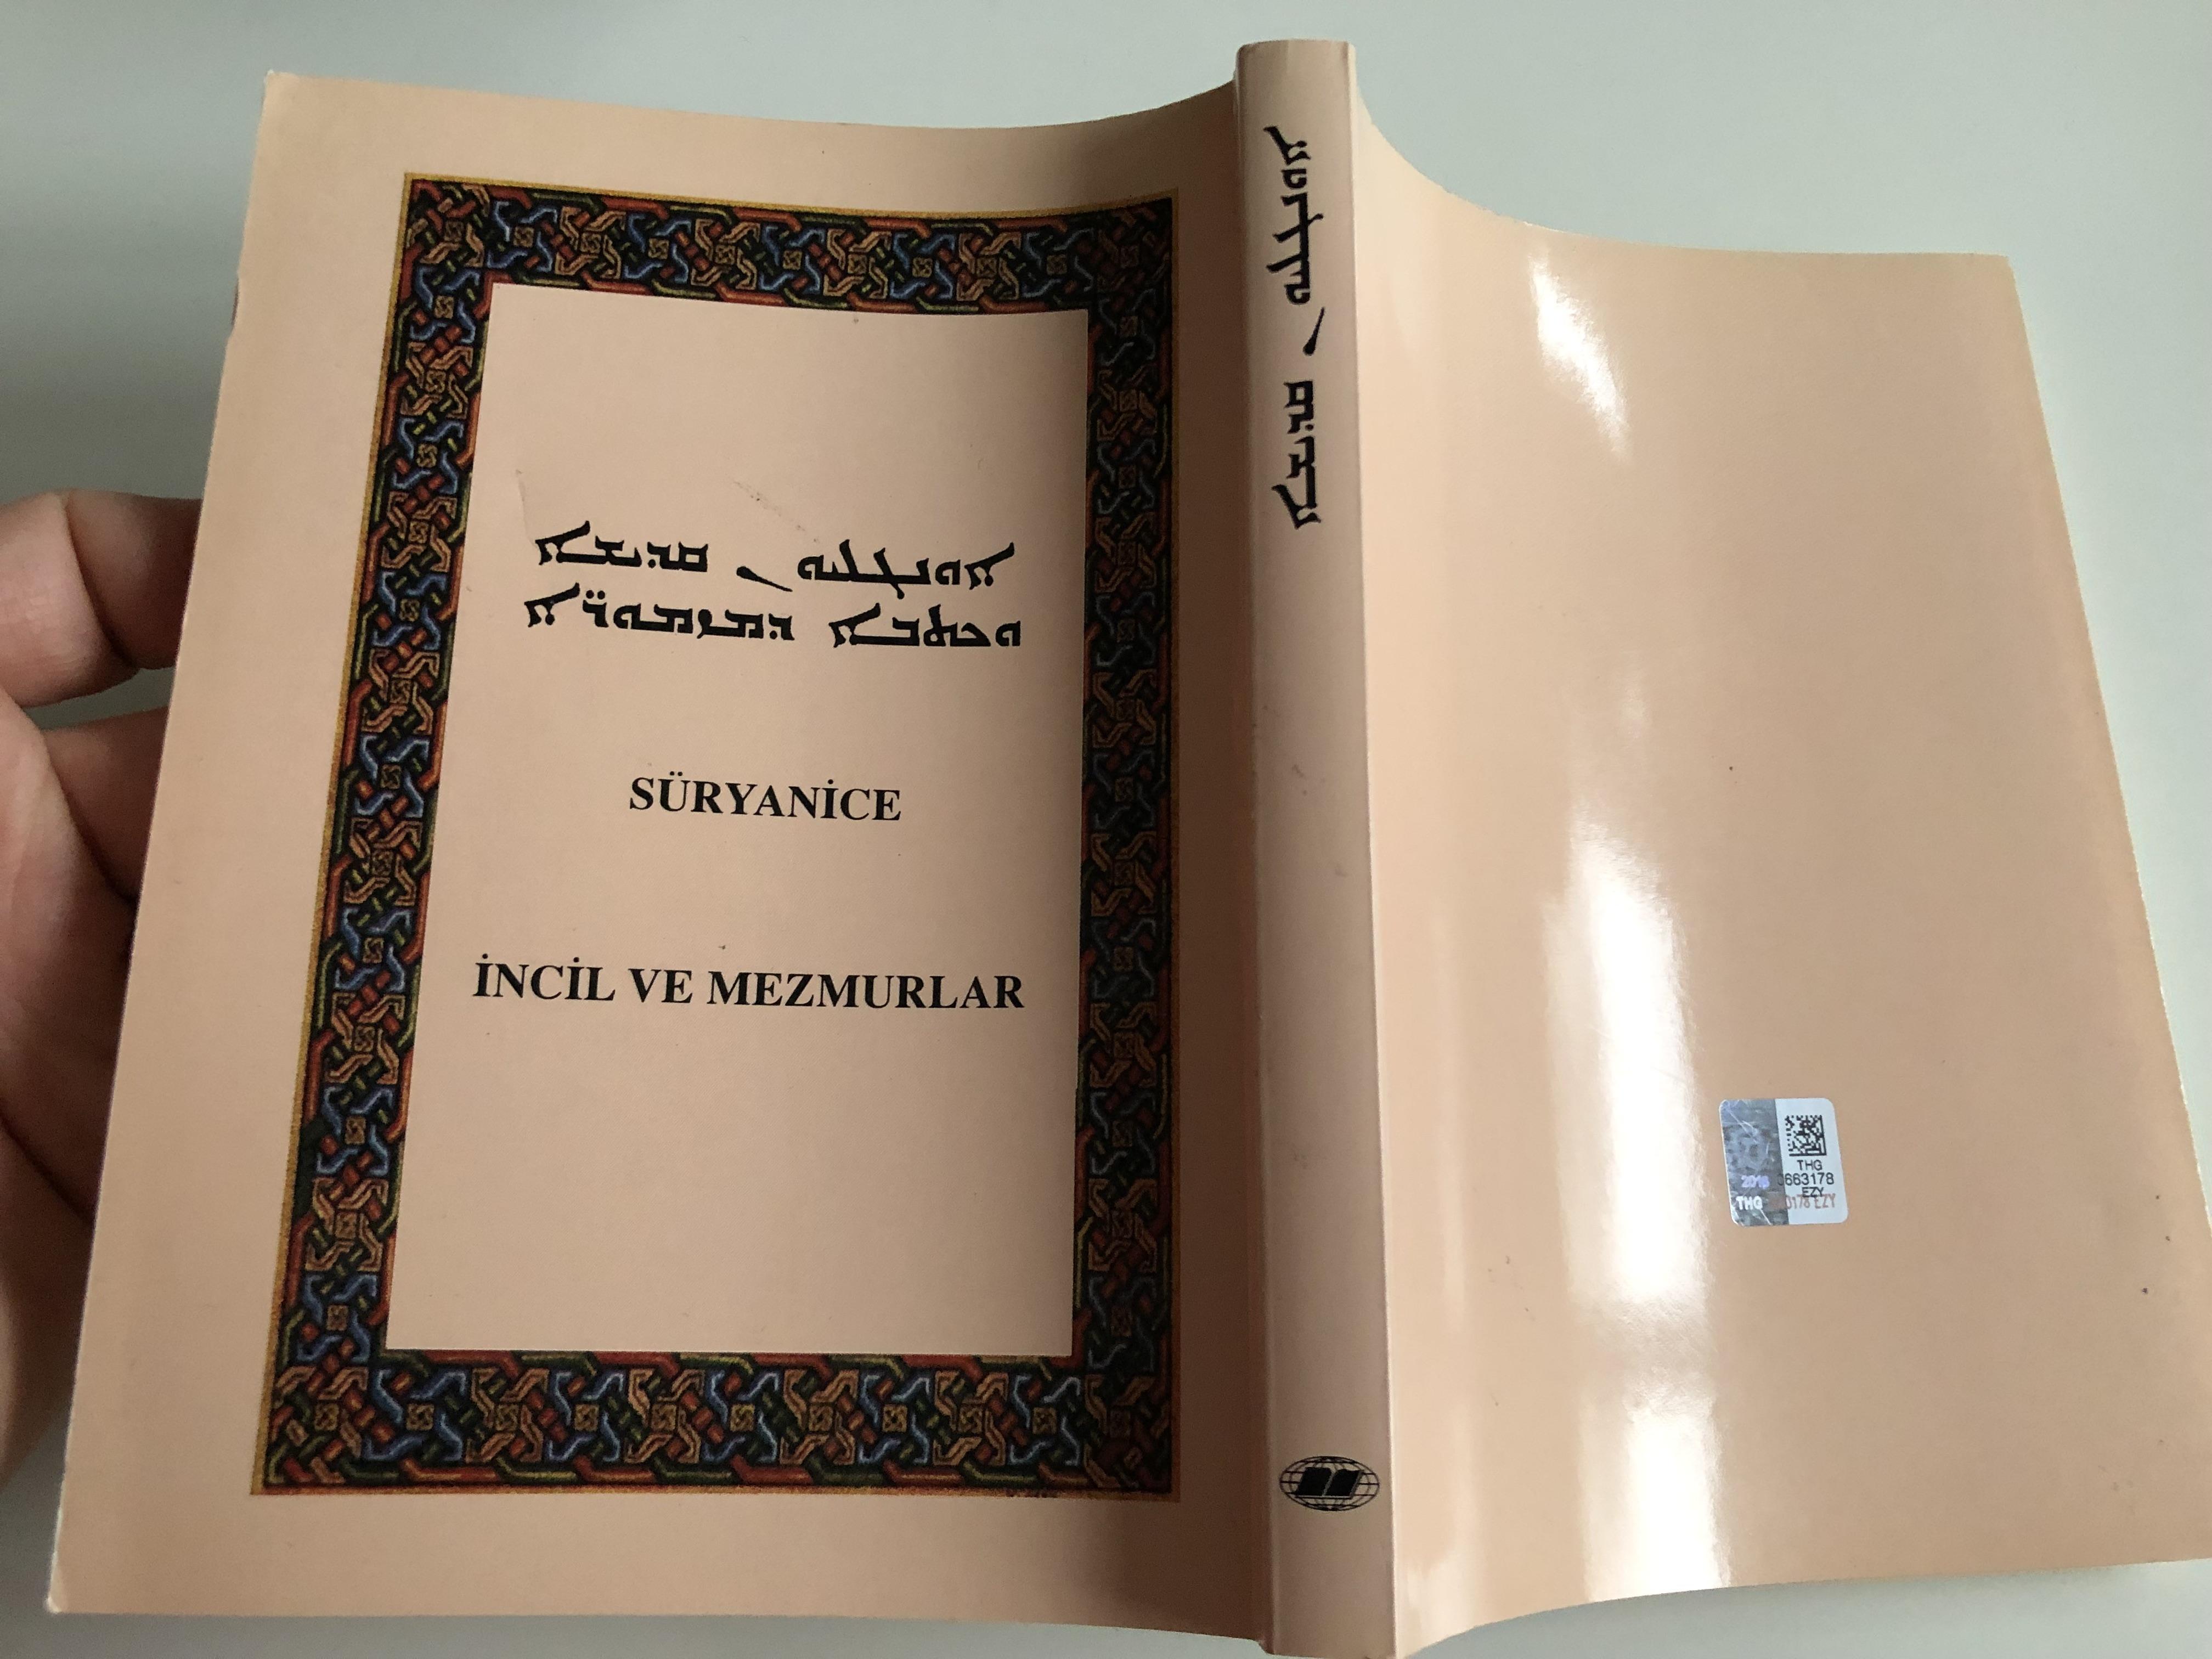 syriac-new-testament-and-psalms-ubs-epf-1998-pshitto-nt-2-.jpg